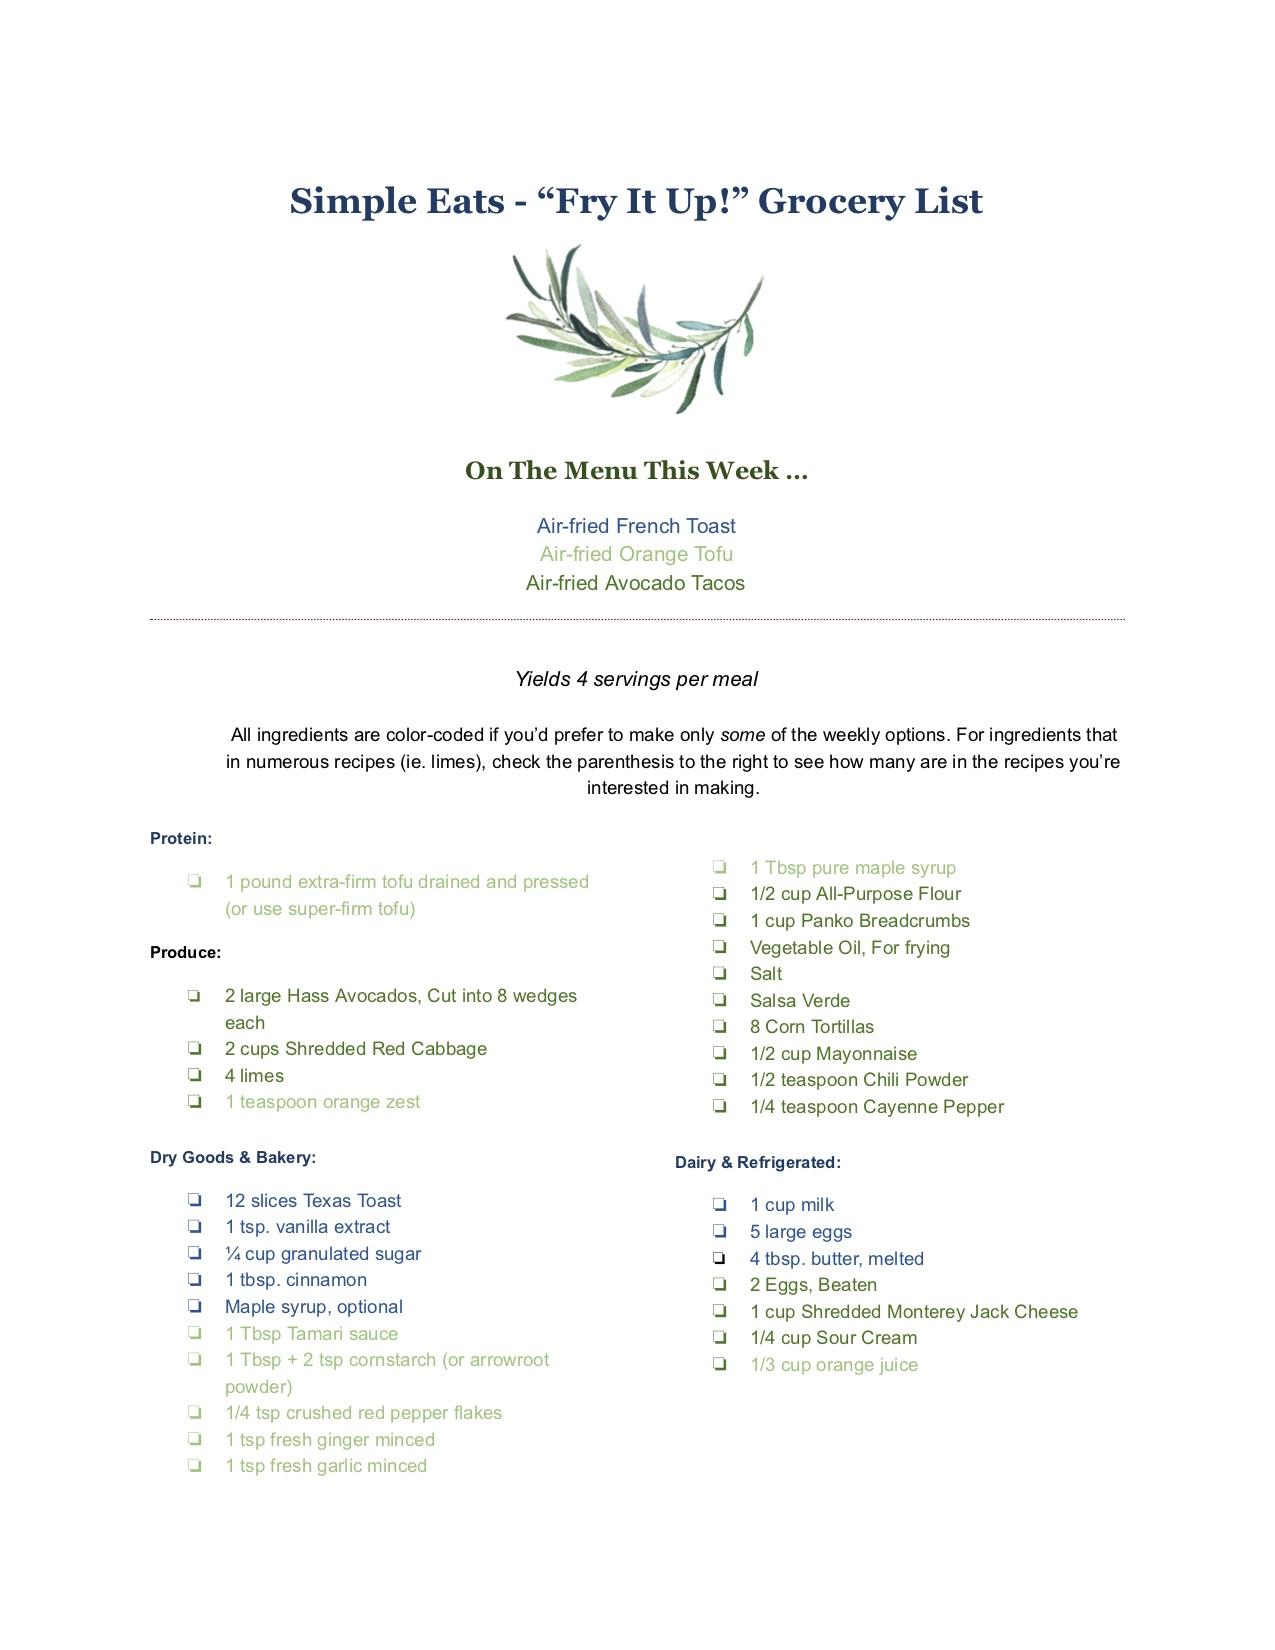 Air-Fried grocery list.jpg